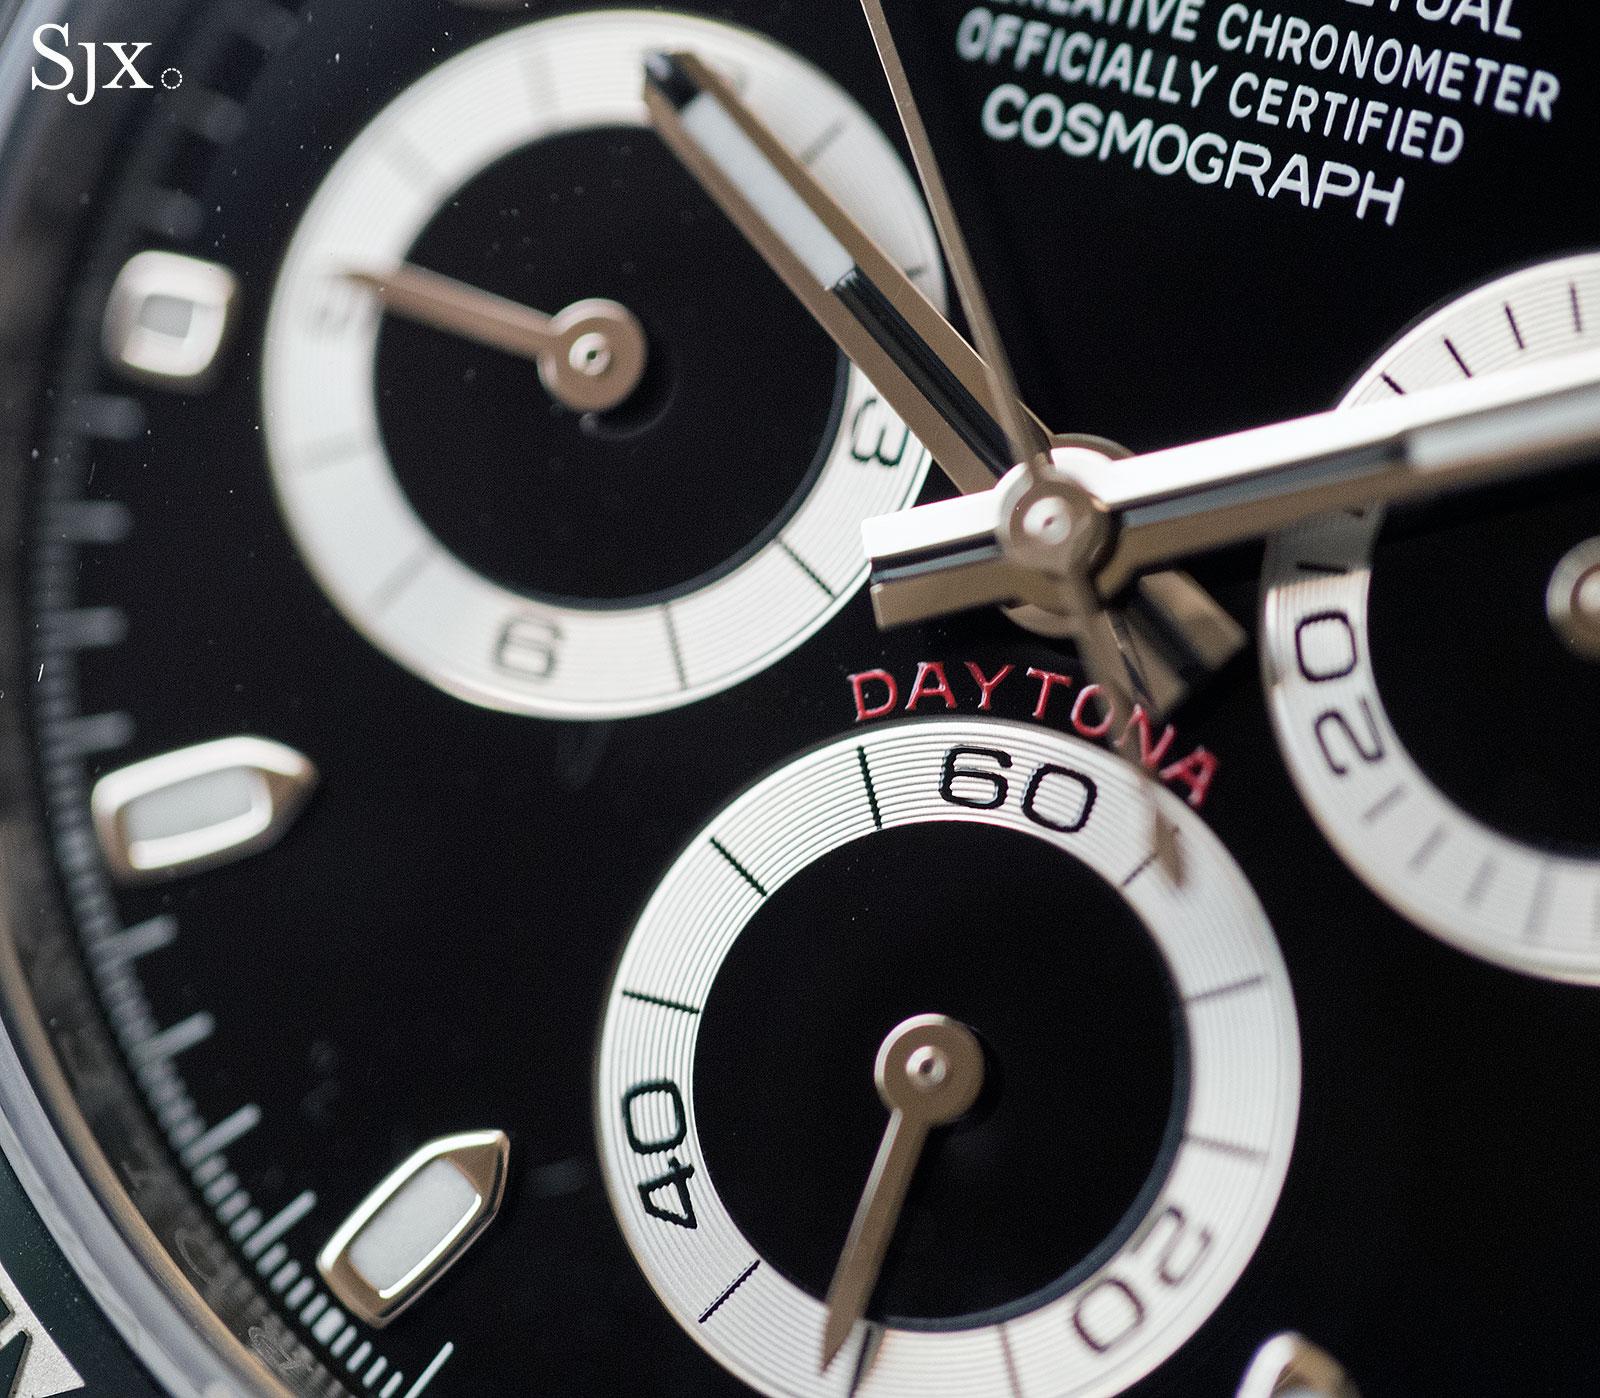 Rolex Daytona Ceramic Black Dial 116500LN - 1